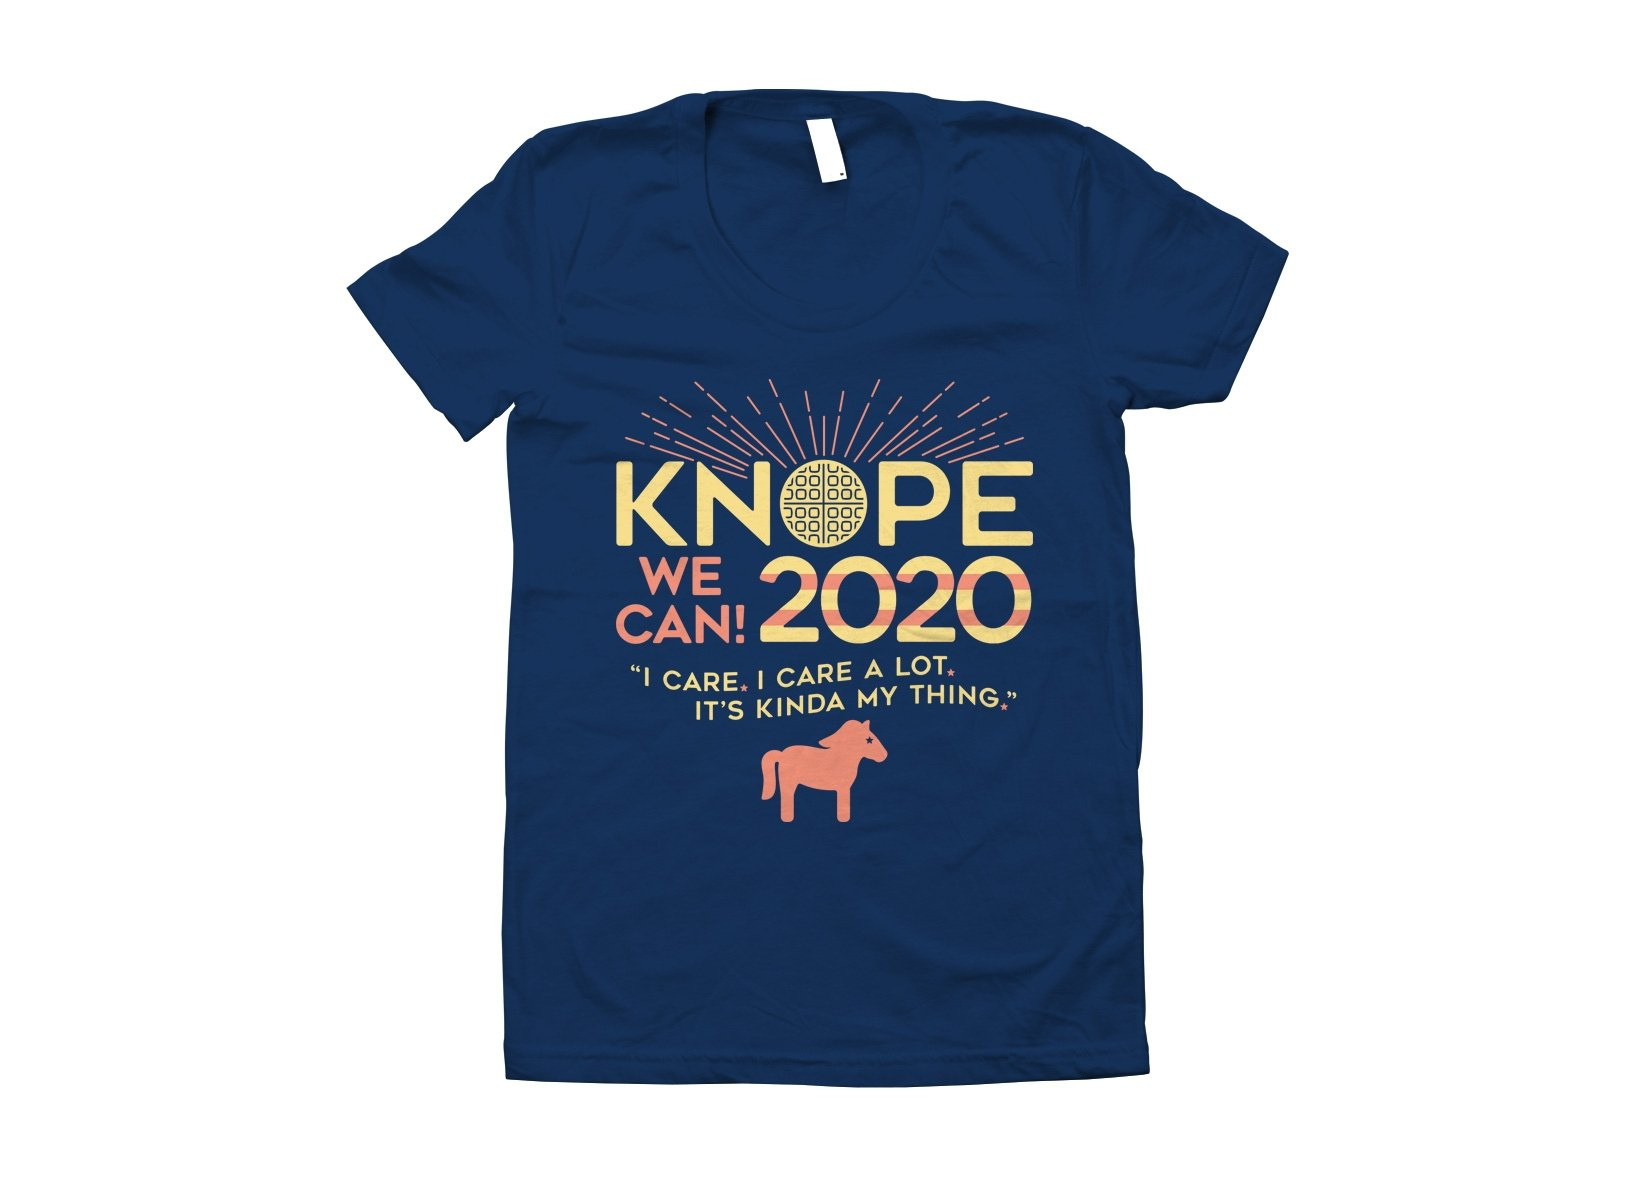 Knope 2020 on Juniors T-Shirt